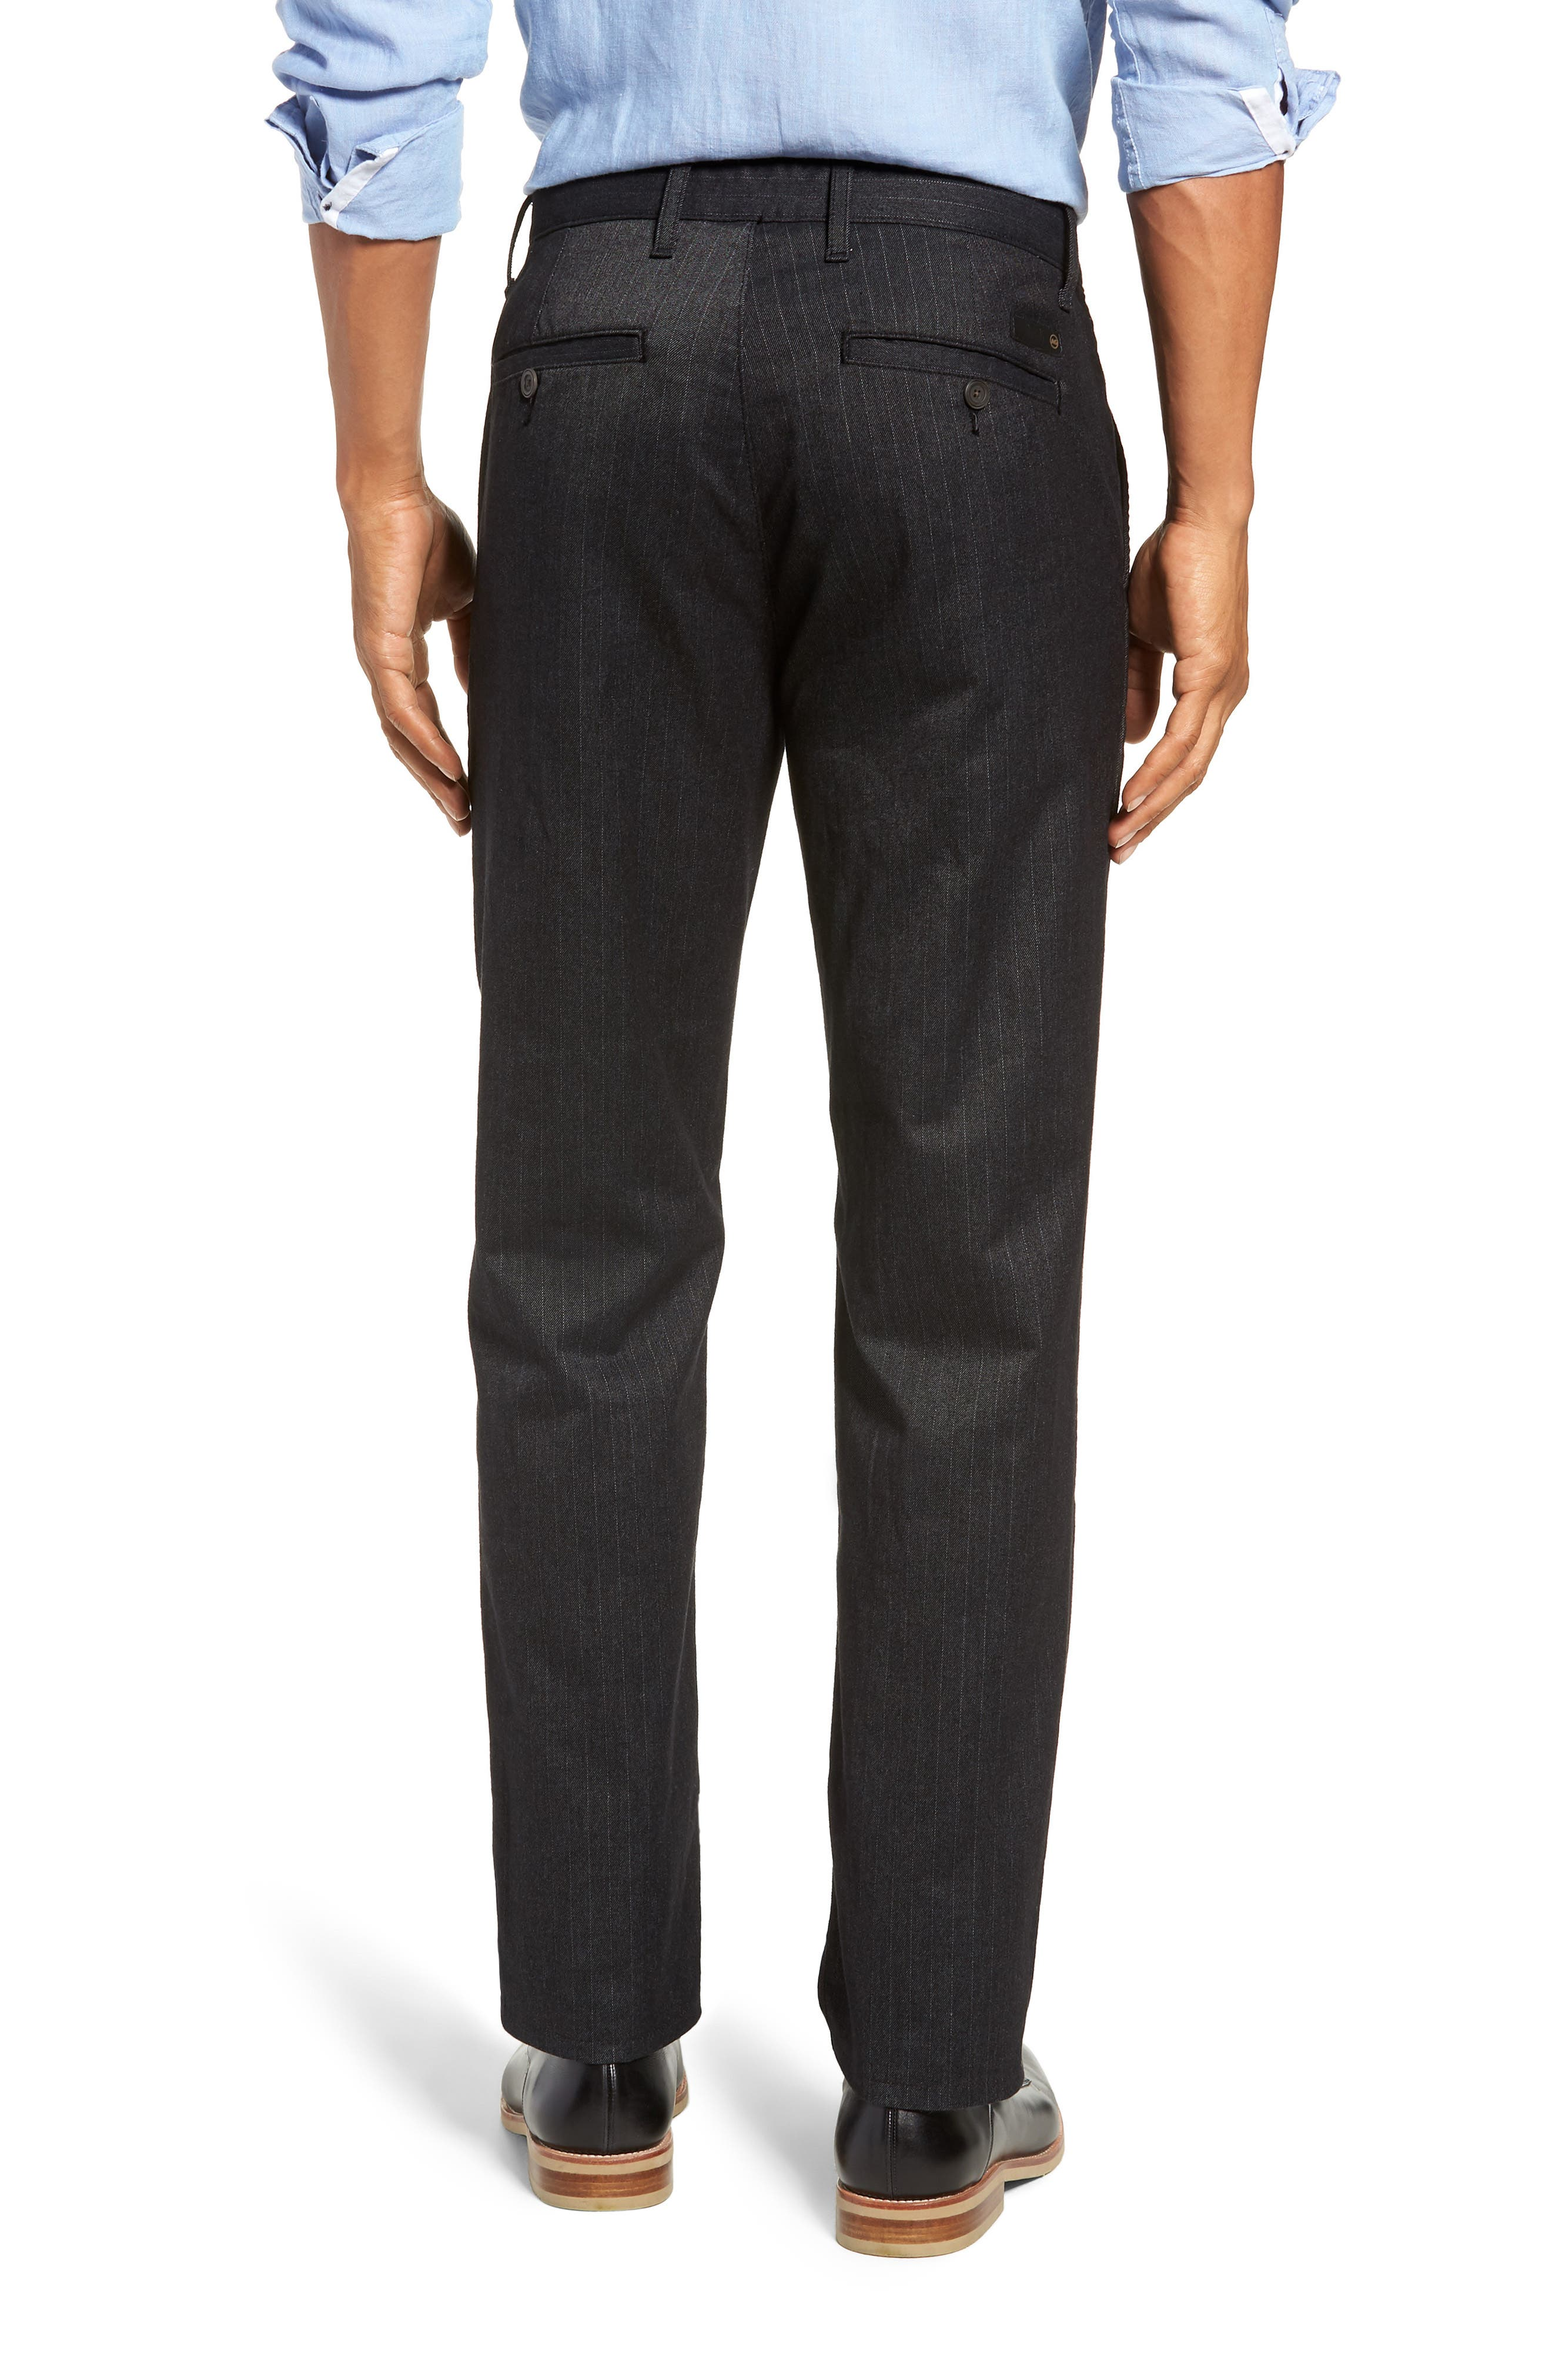 Marshall Slim Fit Pinstripe Pants,                             Alternate thumbnail 2, color,                             HEATHERED MELANGE BLACK